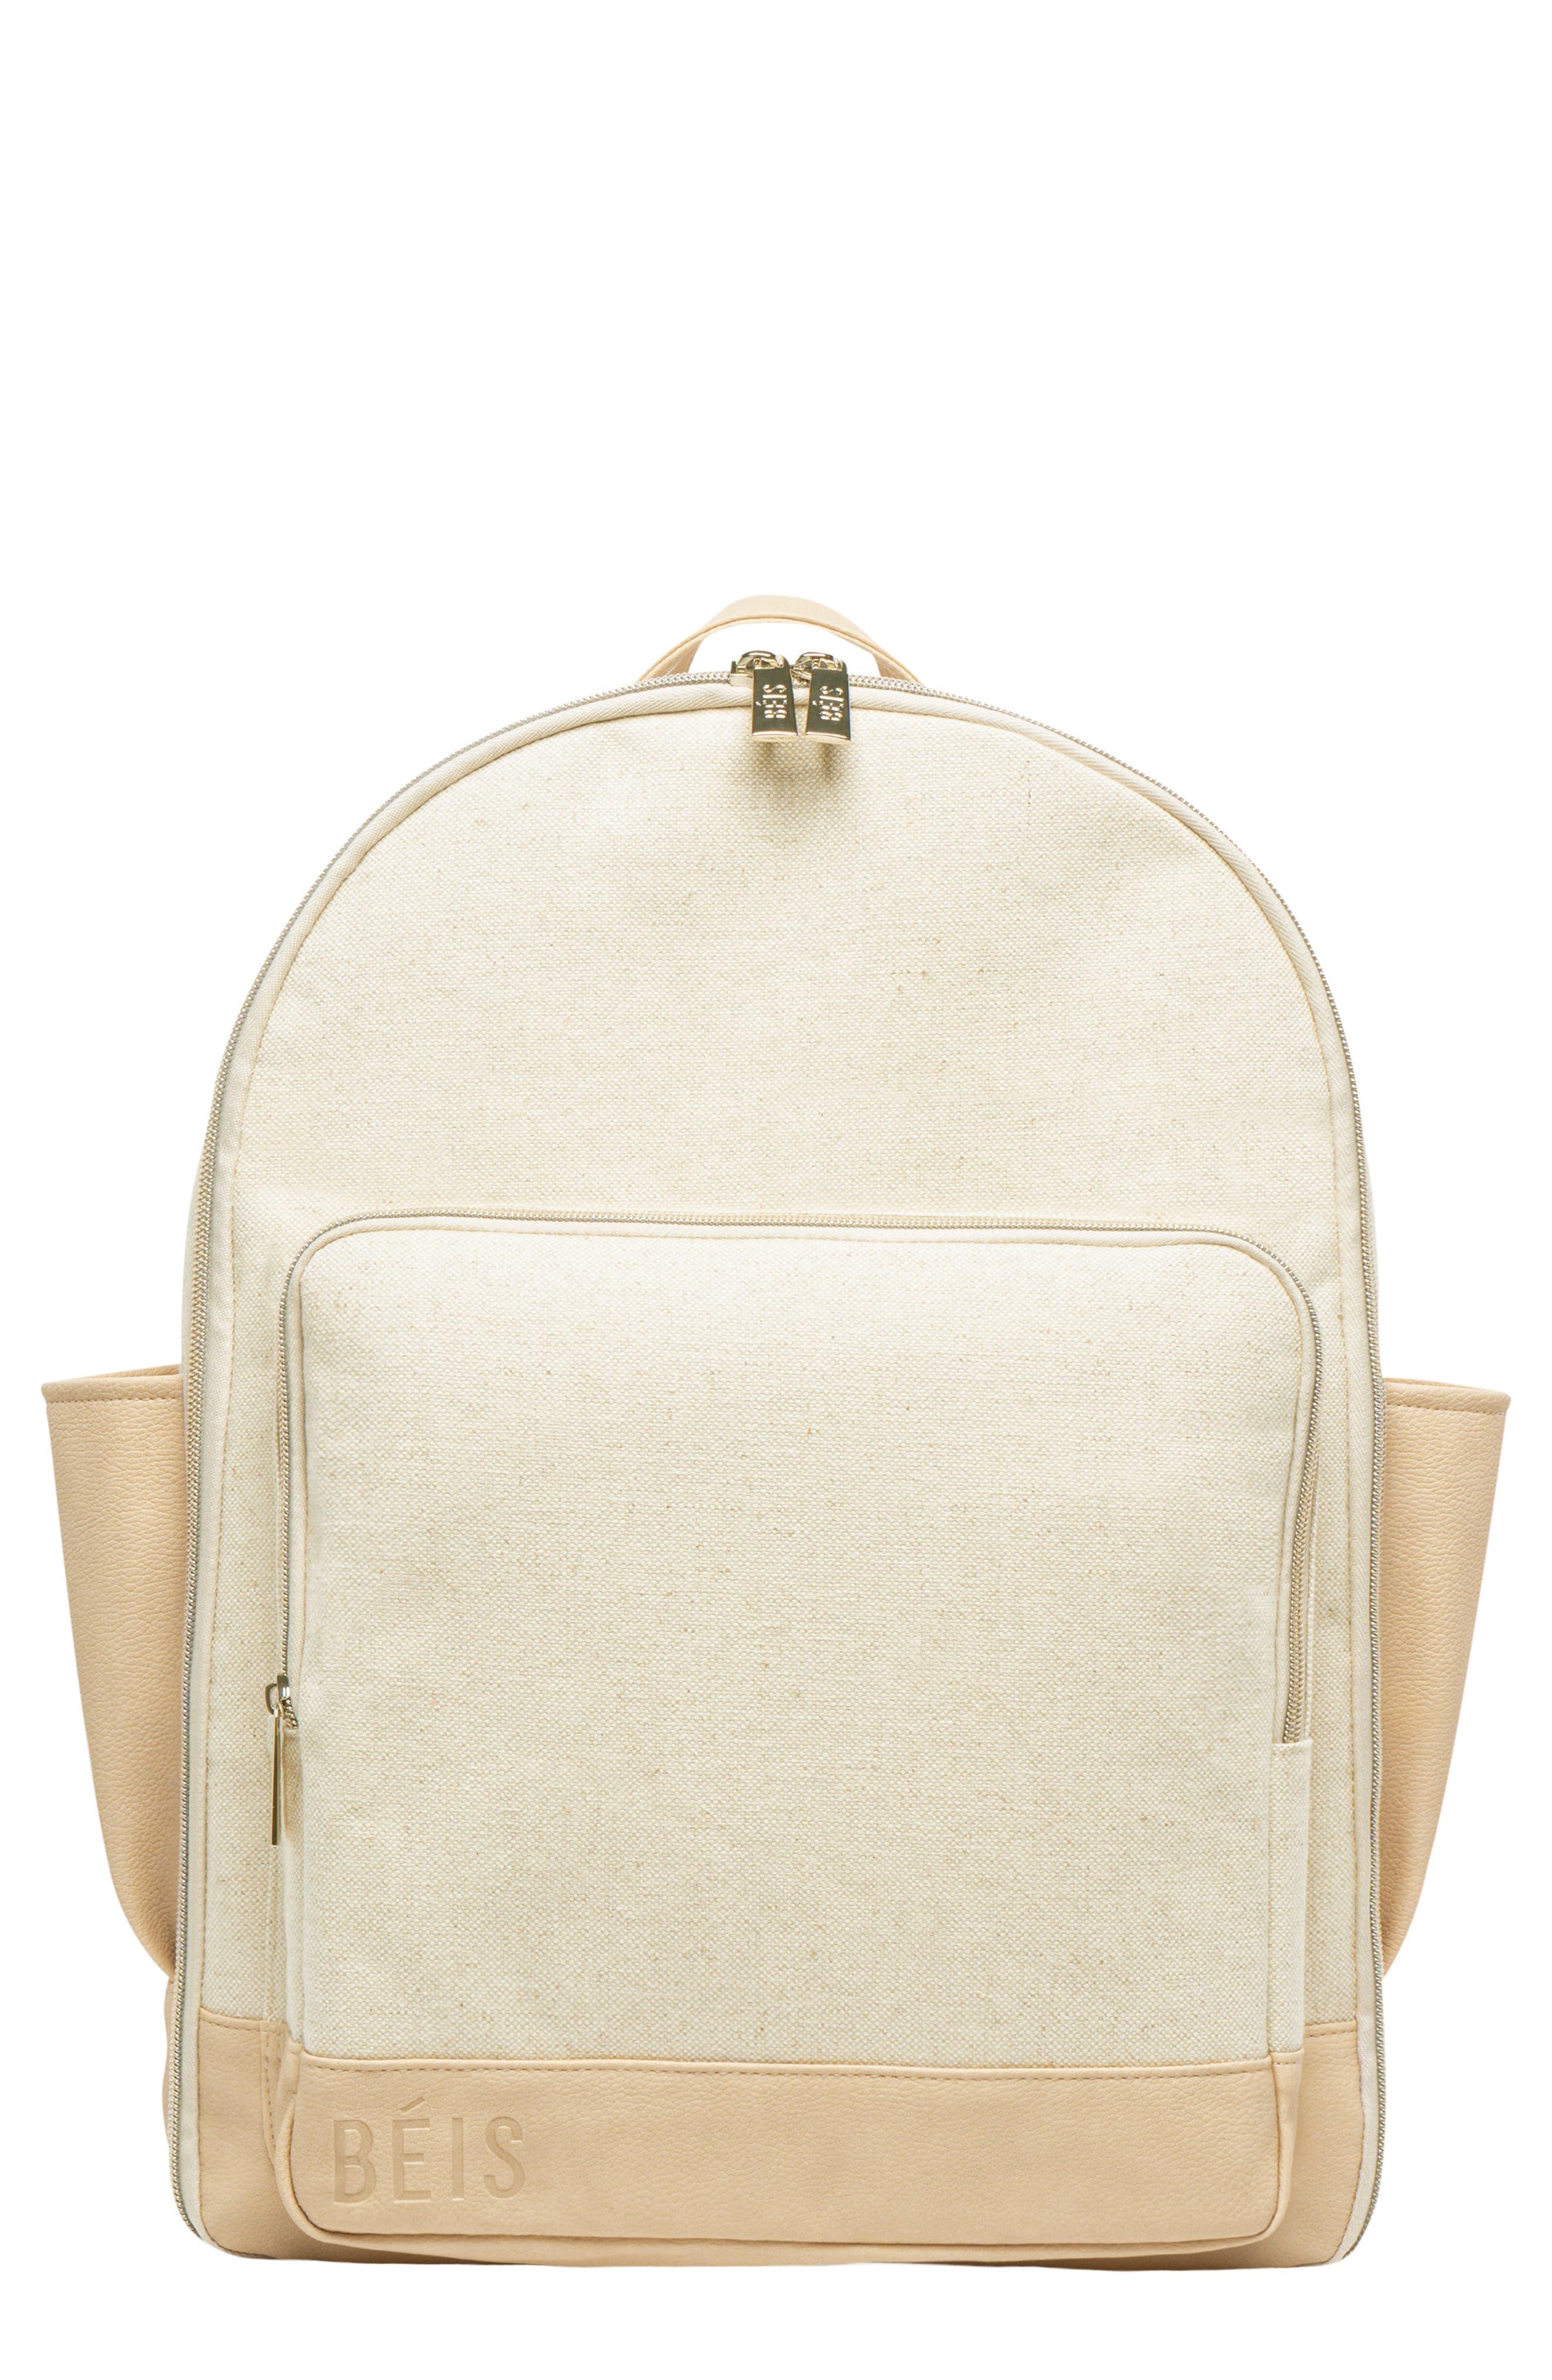 BÉIS, Travel Multi Function Travel Backpack, Main thumbnail 1, color, BEIGE